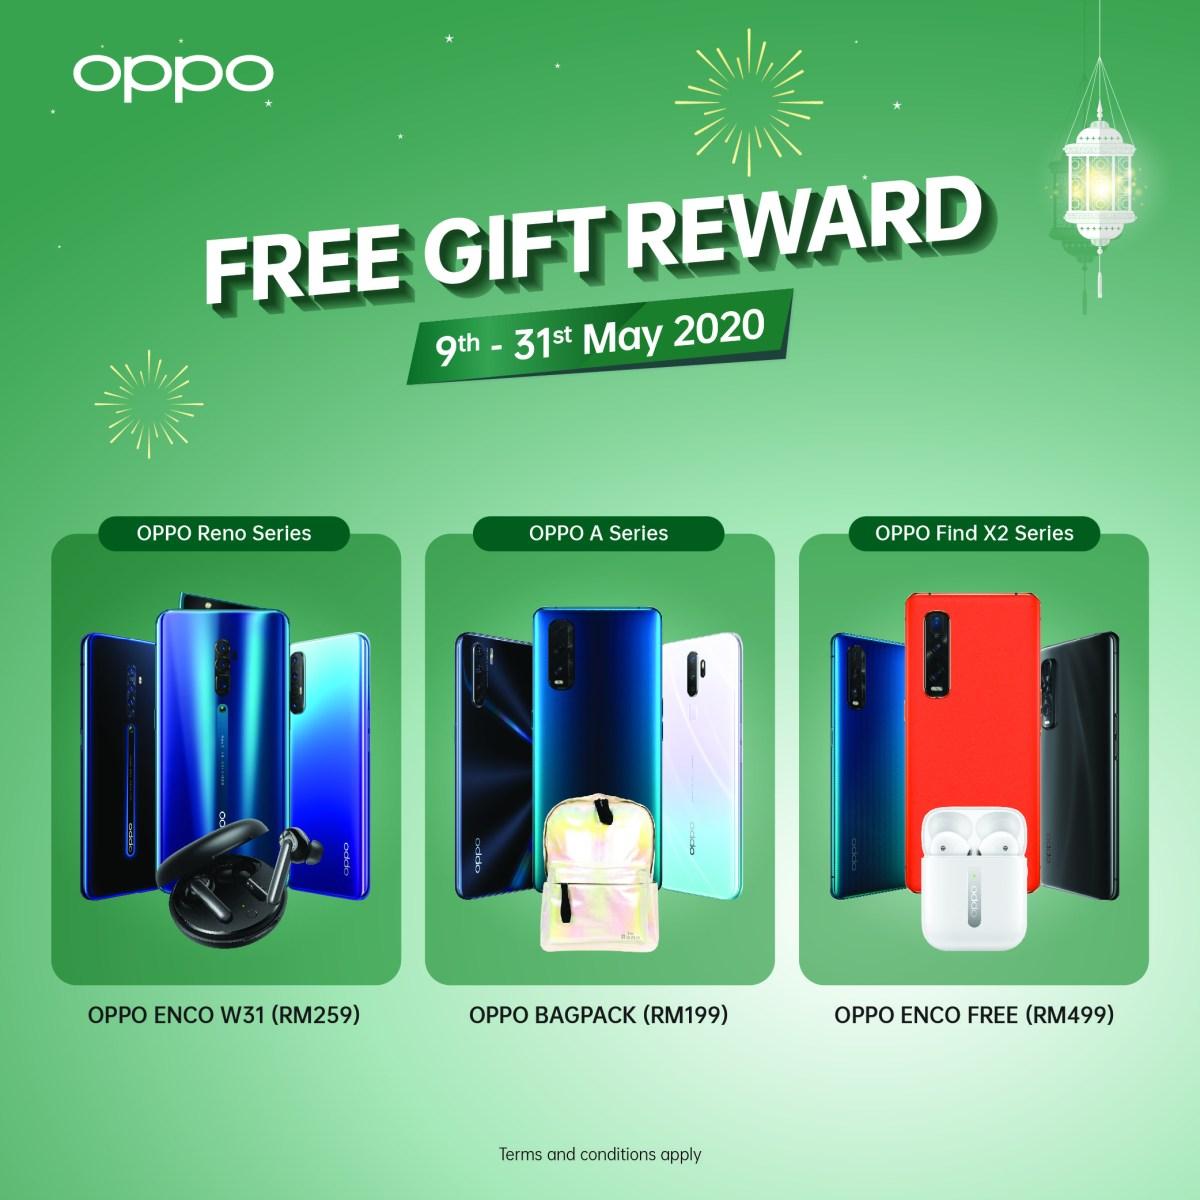 OPPO Raya期间送好康!Find X2、Reno系列等手机可享最高RM499赠品、参加抽奖还可享现金回扣! OPPO-Raya-Free-Gifts